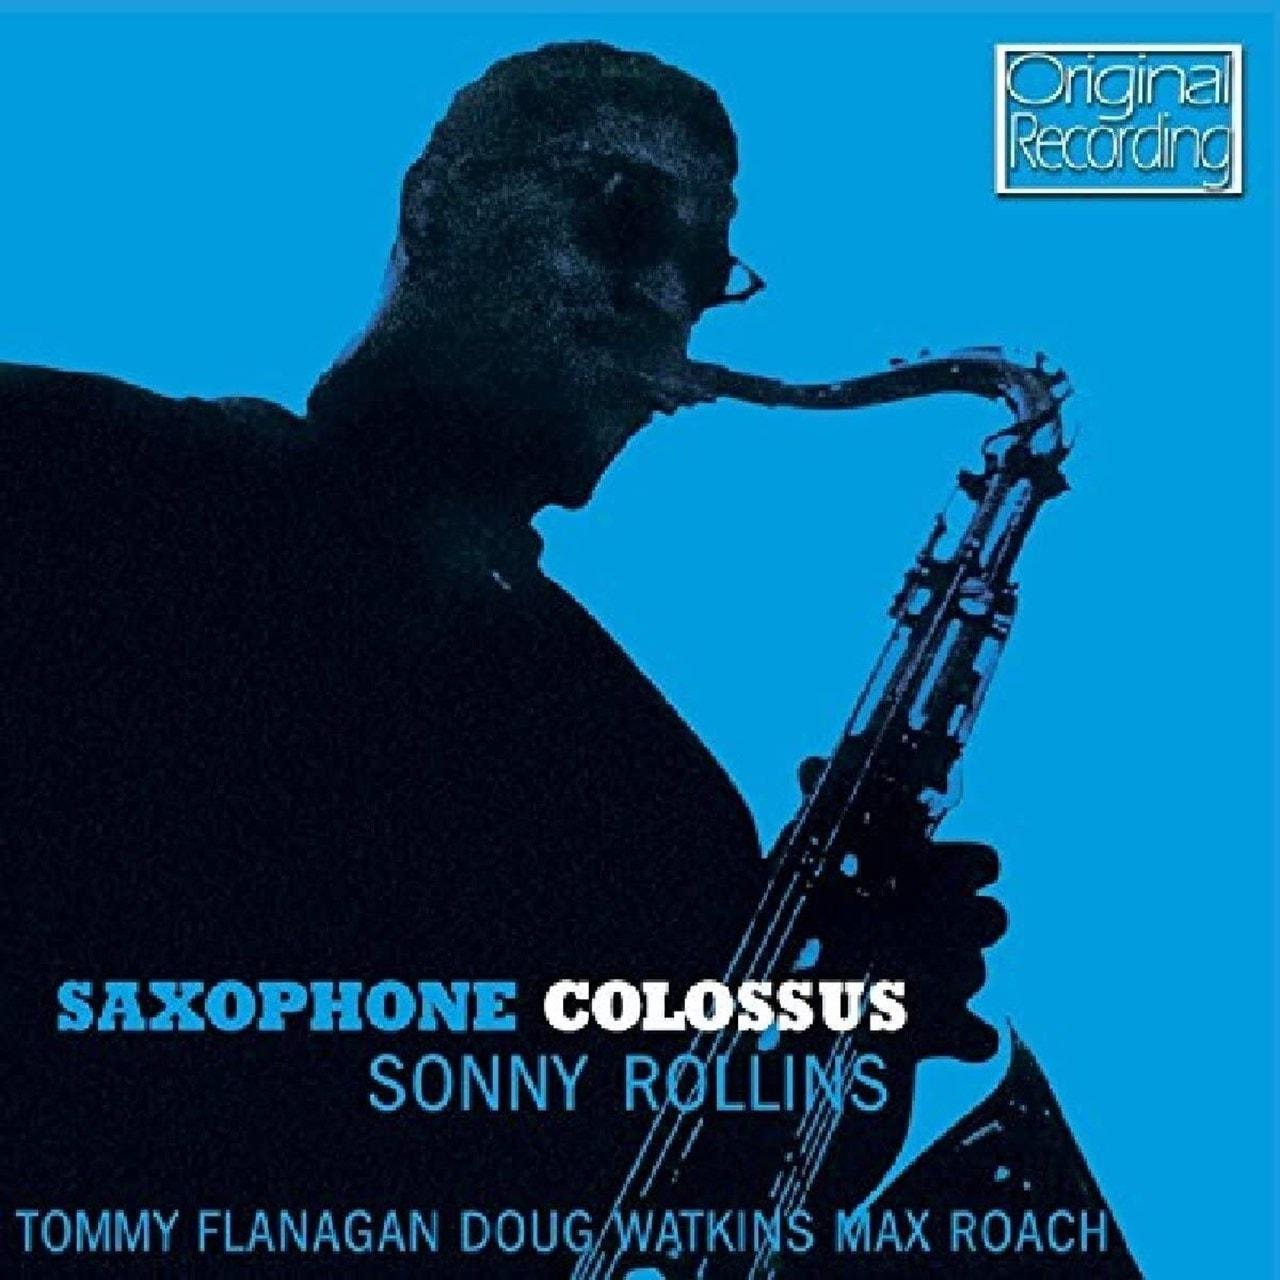 Saxophone Colossus - 1